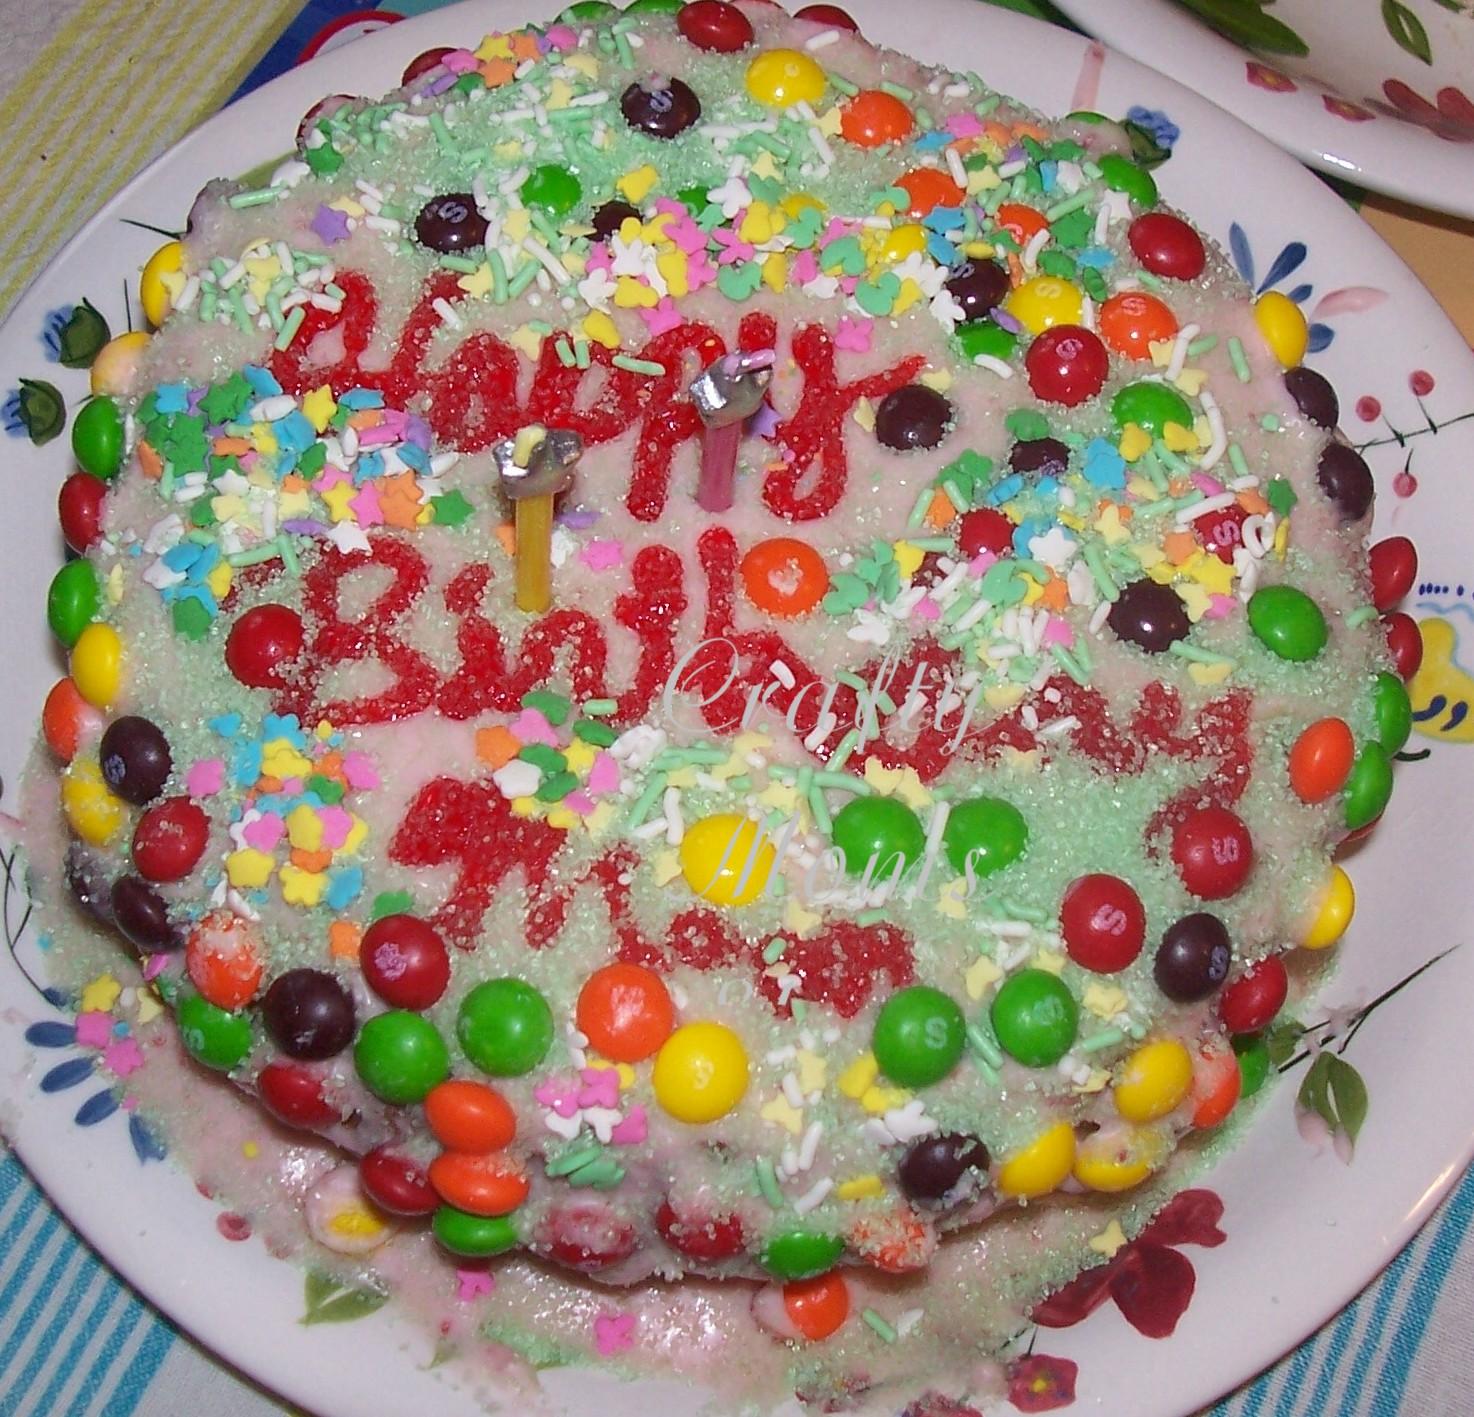 Crafty Moms Share Gluten Free Birthday Cake